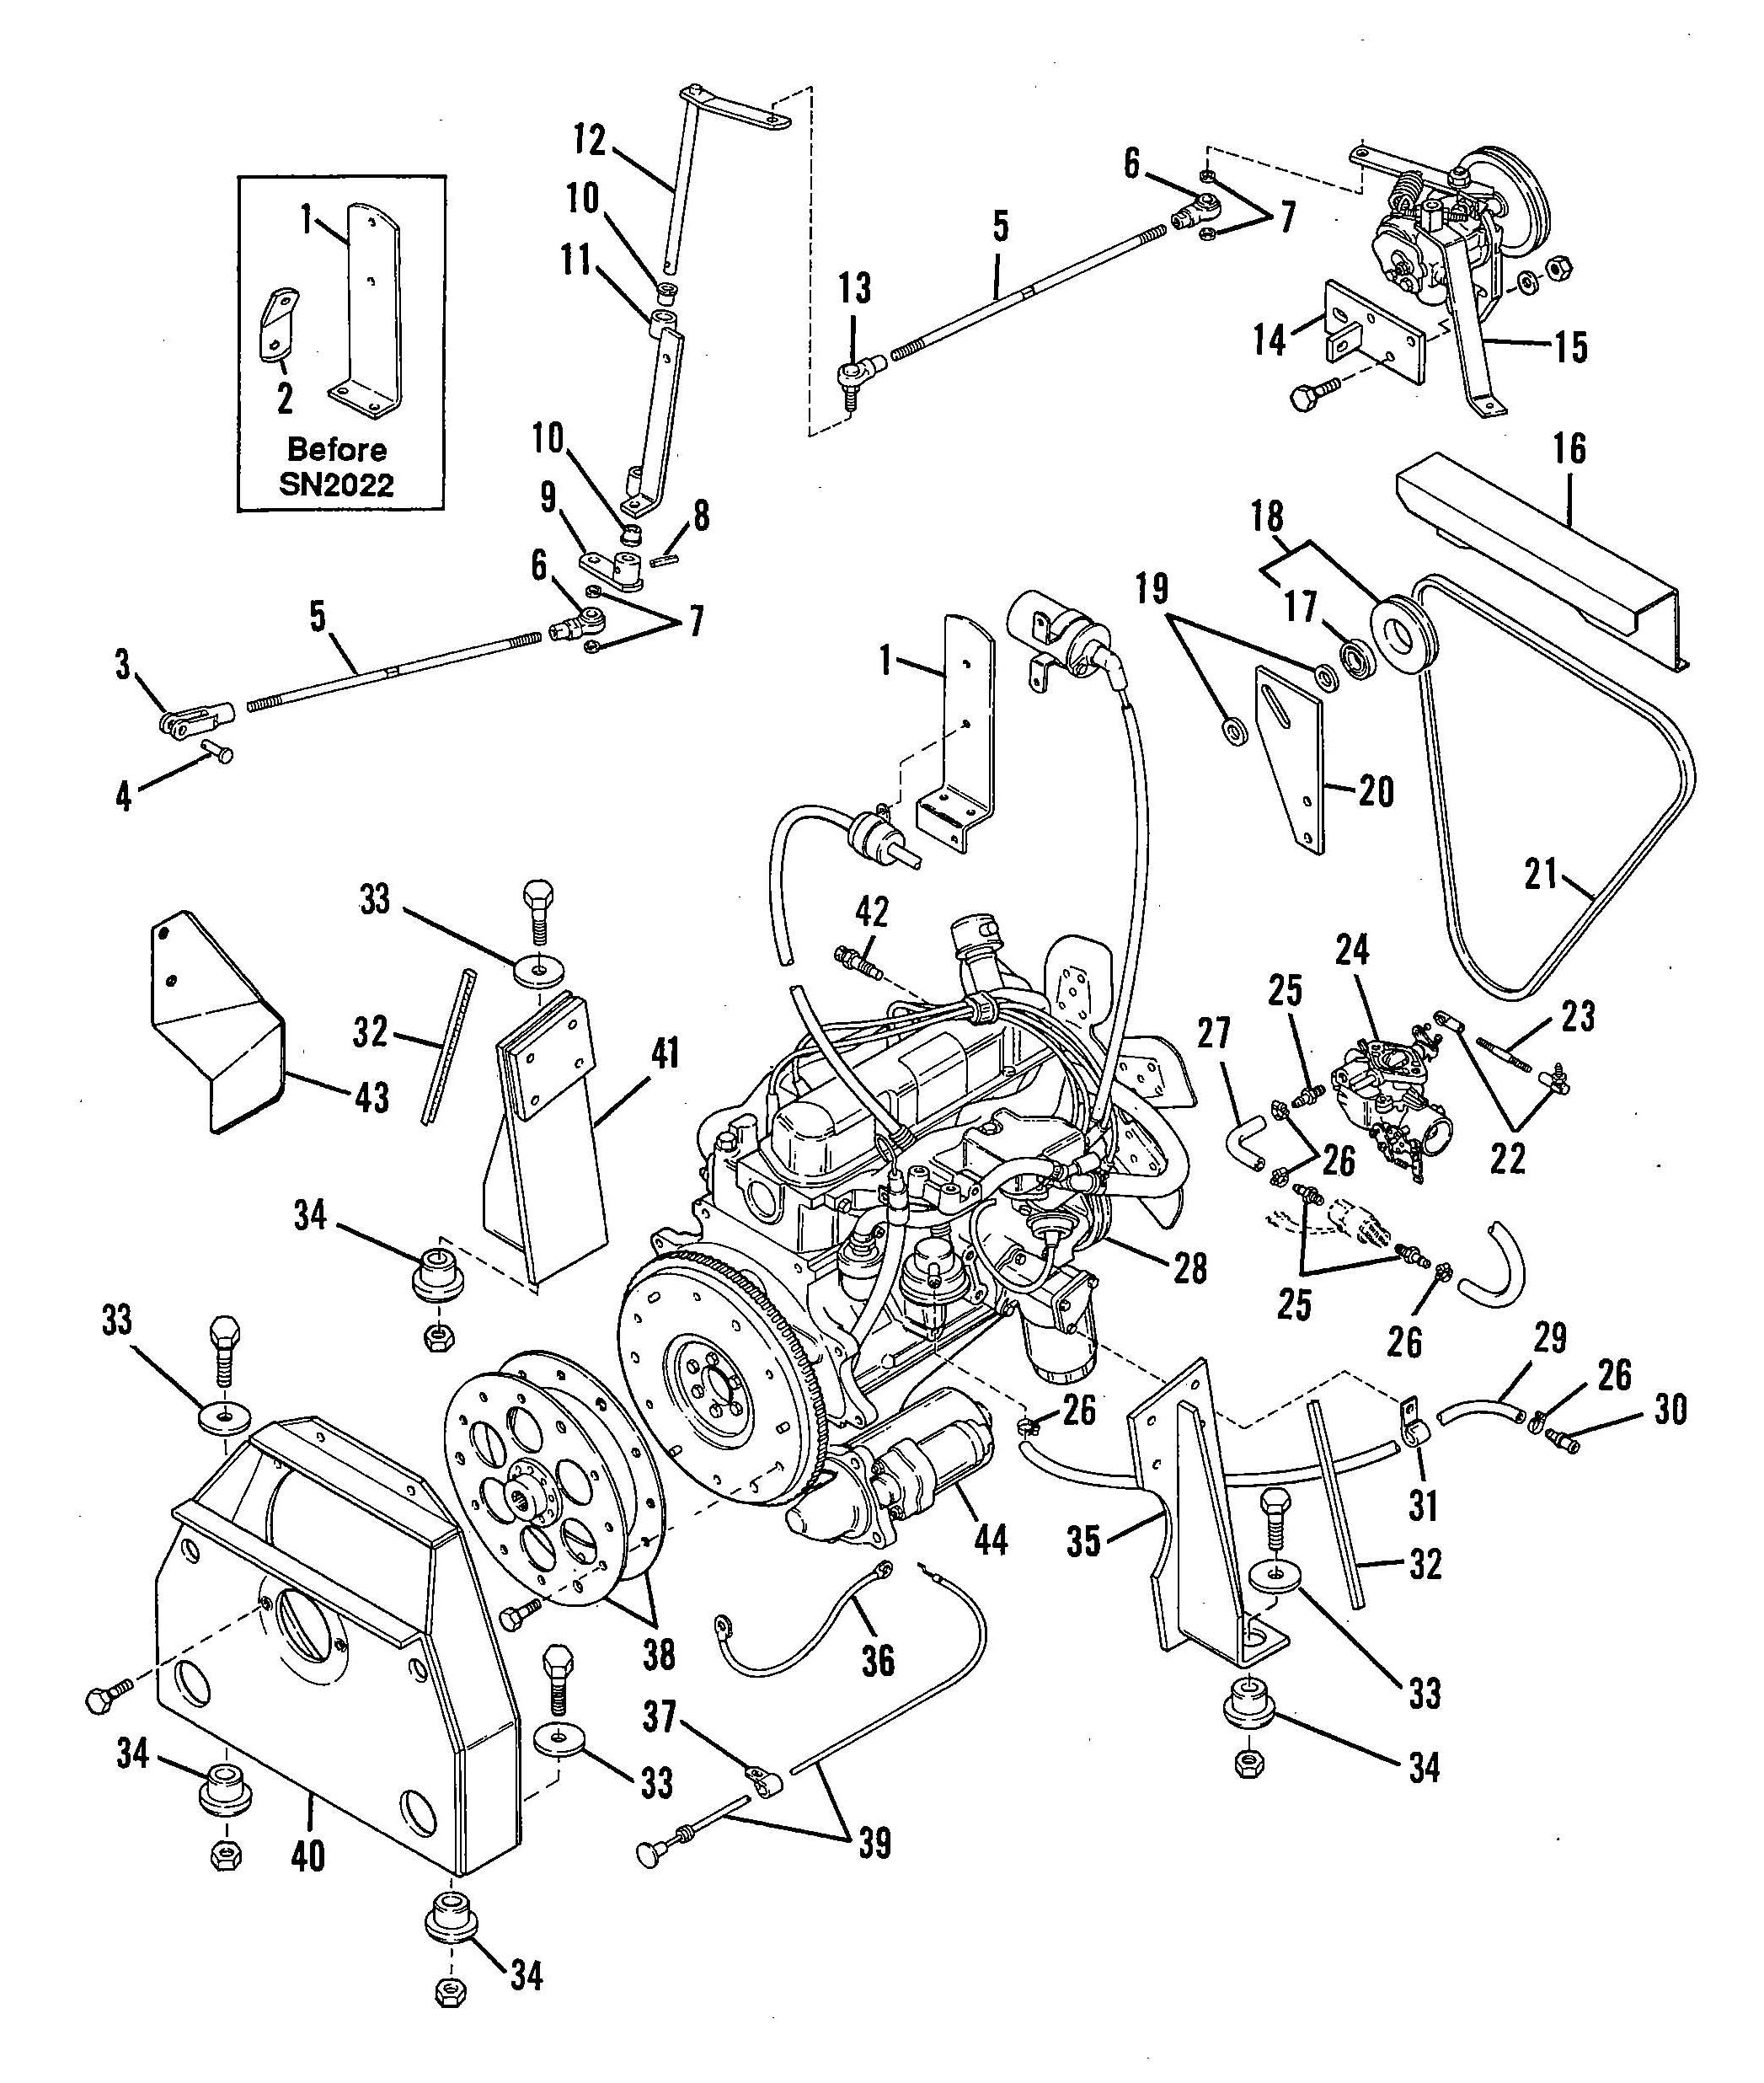 Gehl Skid Loader 3510 3610 Sl3510 Only Gas Engine Wiring Diagram Notes